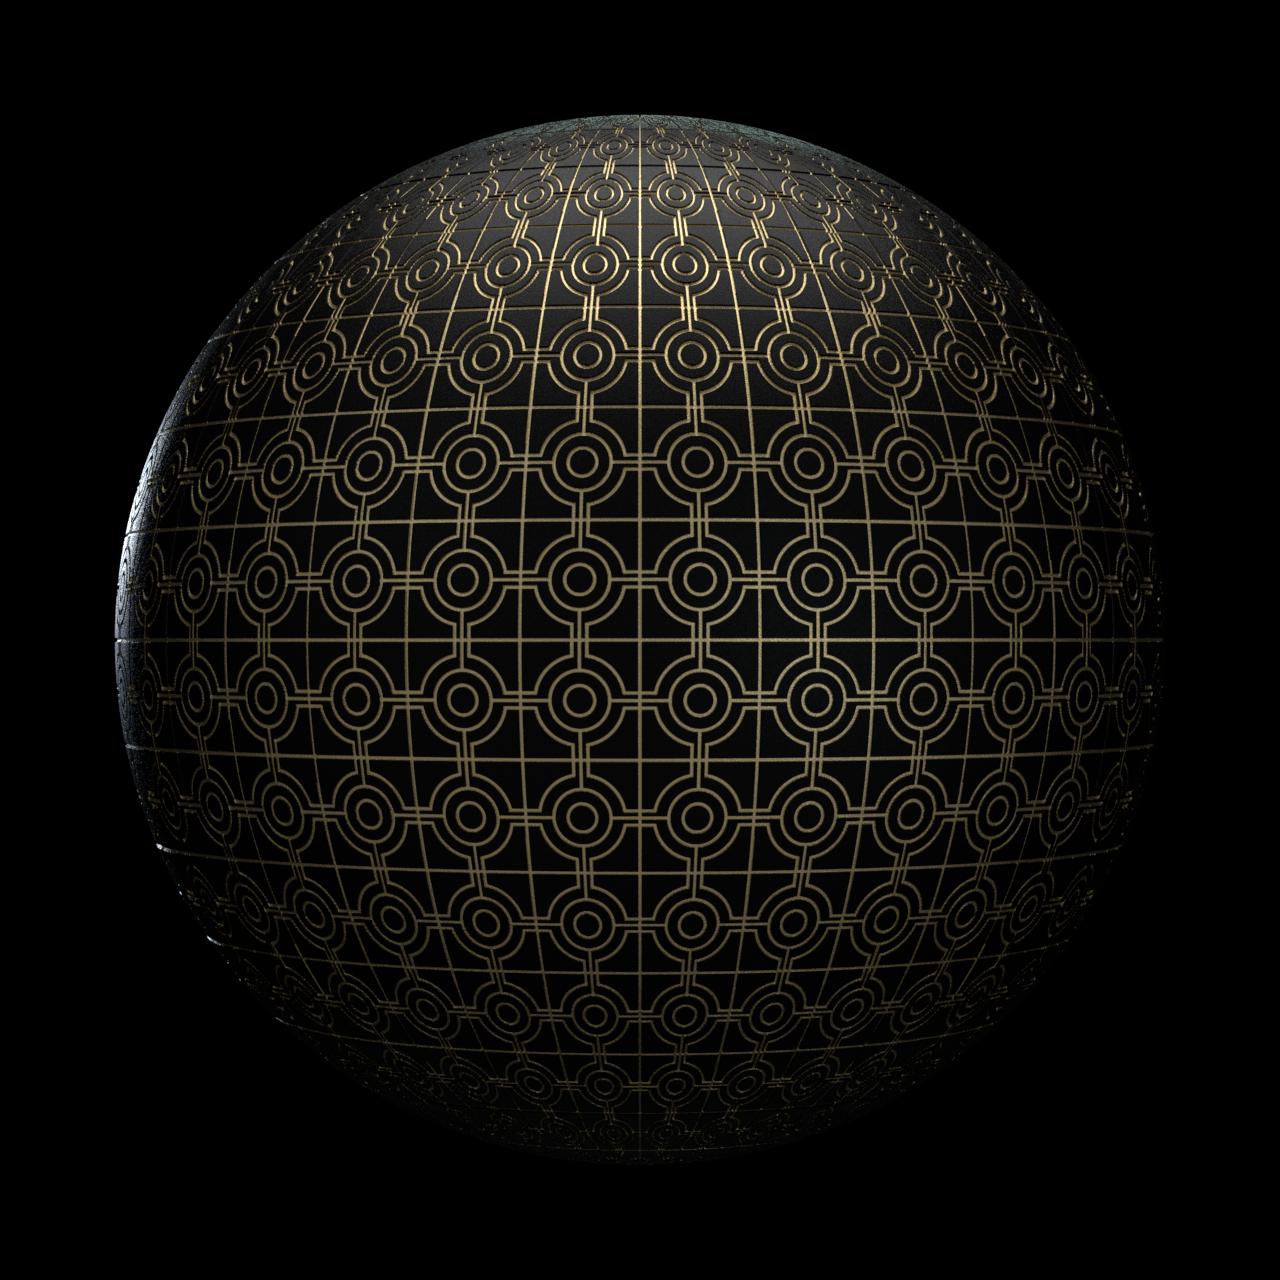 byc_geometric_pack_01_v01.jpg